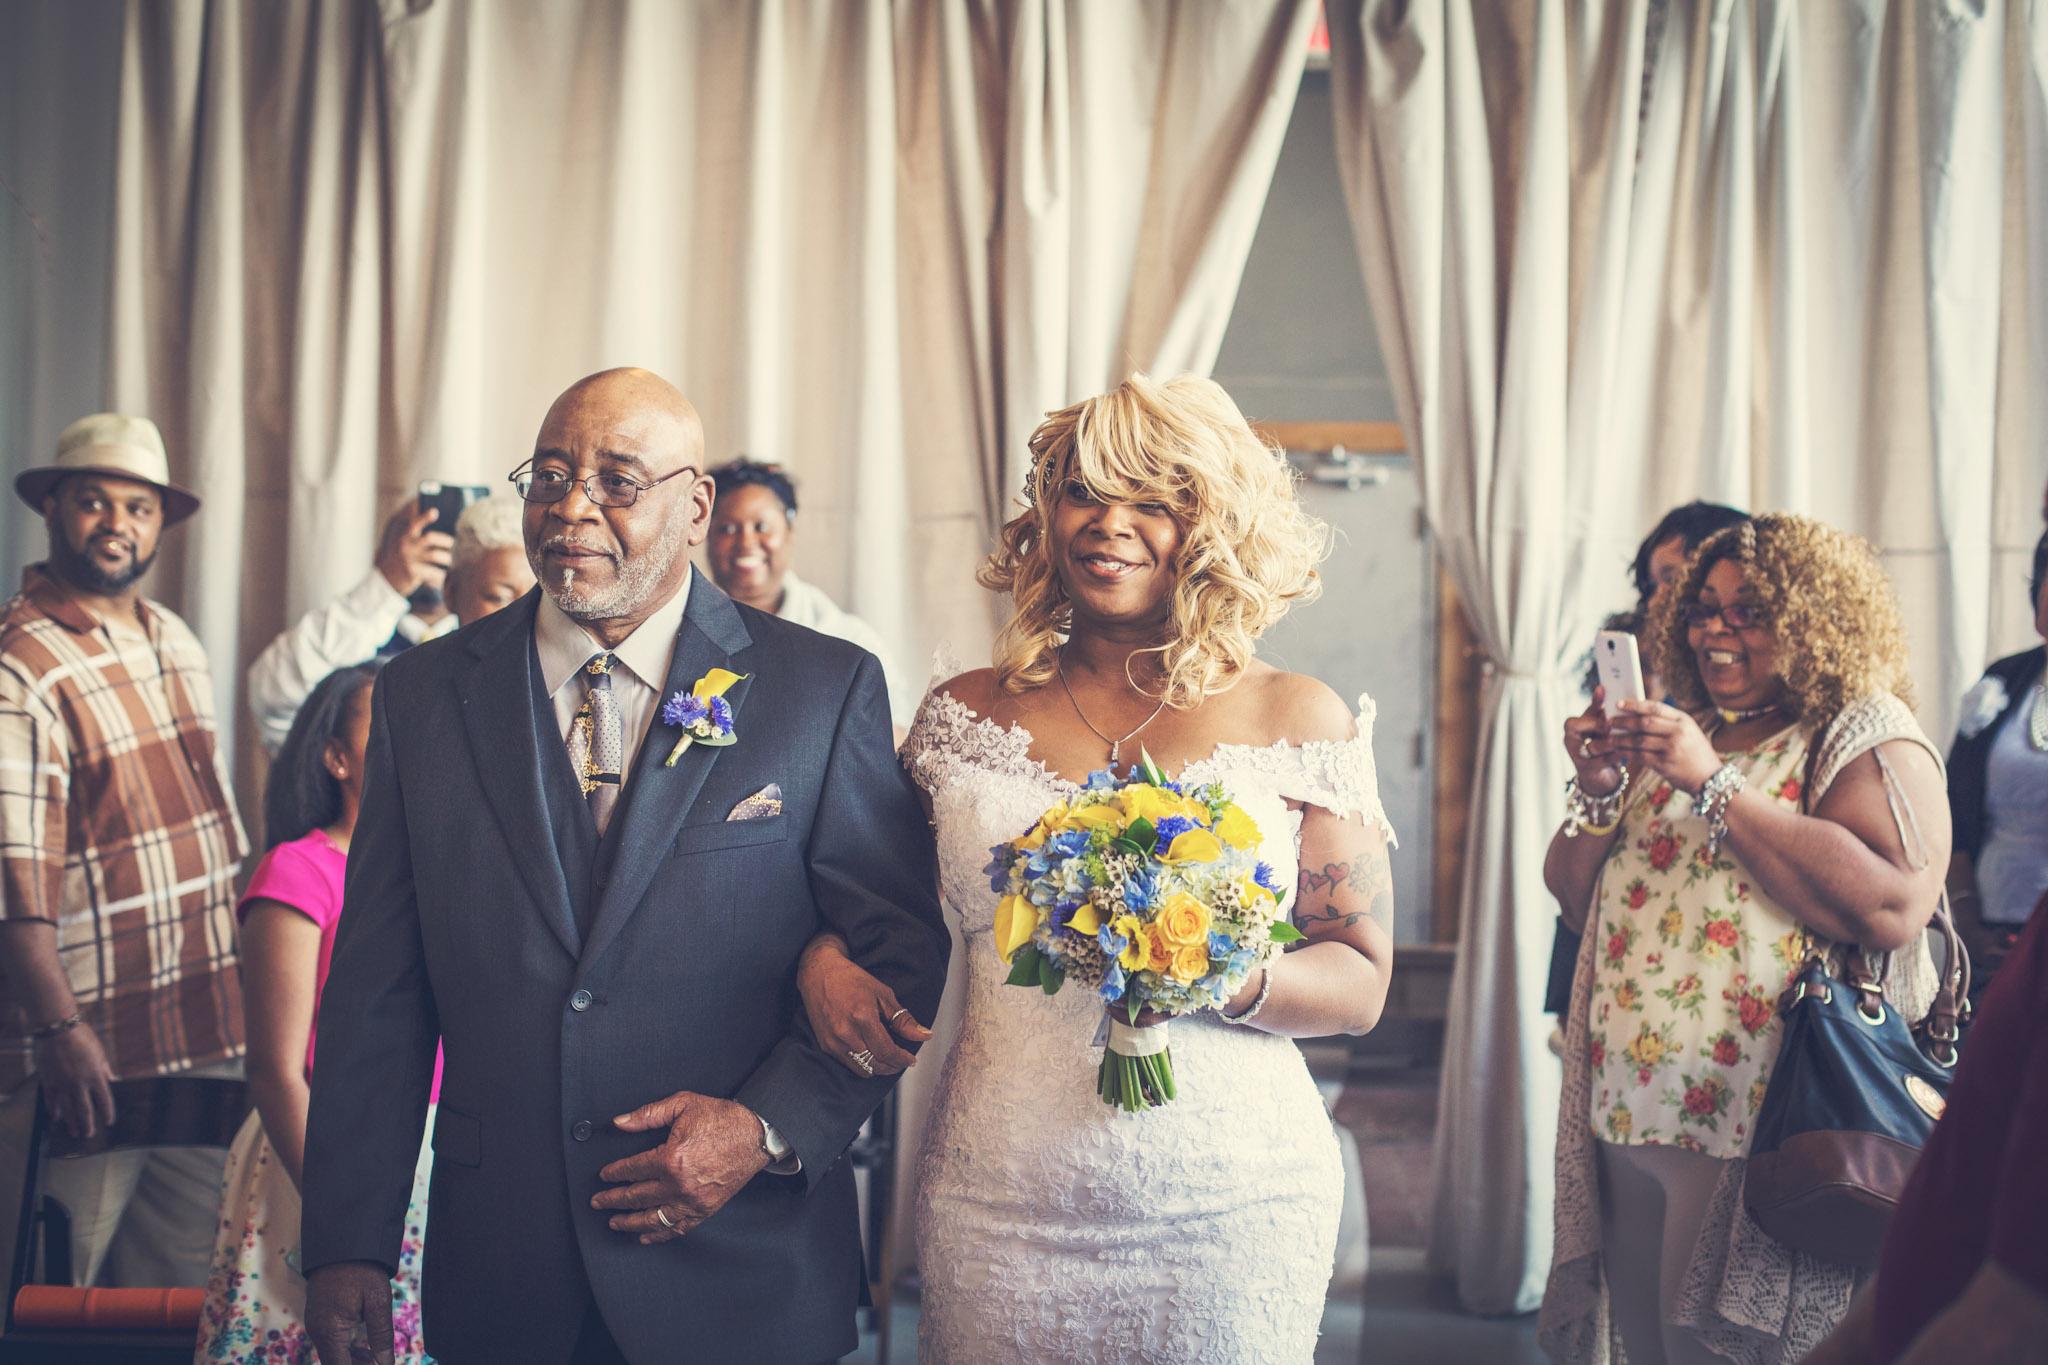 Kansas_City_Small_Wedding_Venue_Elope_Intimate_Ceremony_Budget_Affordable_Mico&Daniel-063b.jpg